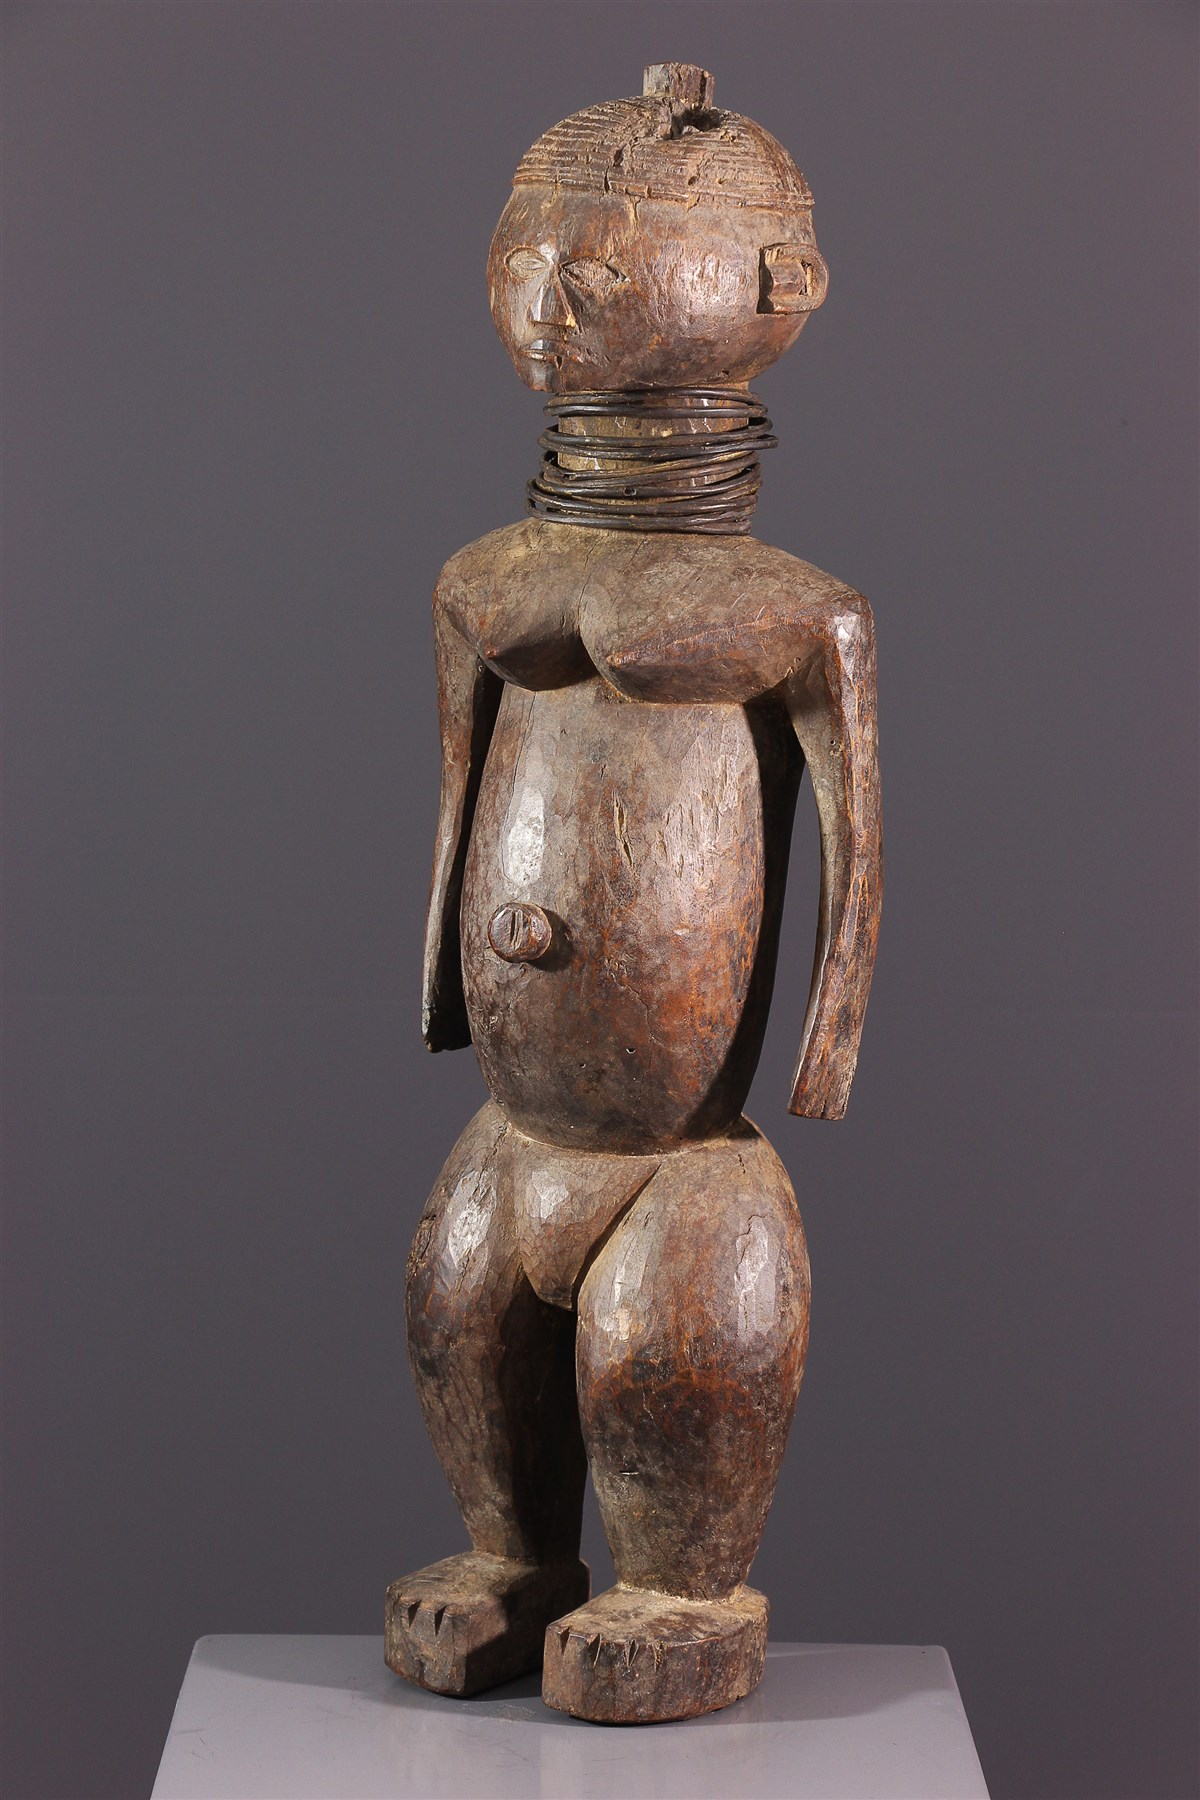 Ngbaka vrouwenfiguur - Afrikaanse kunst